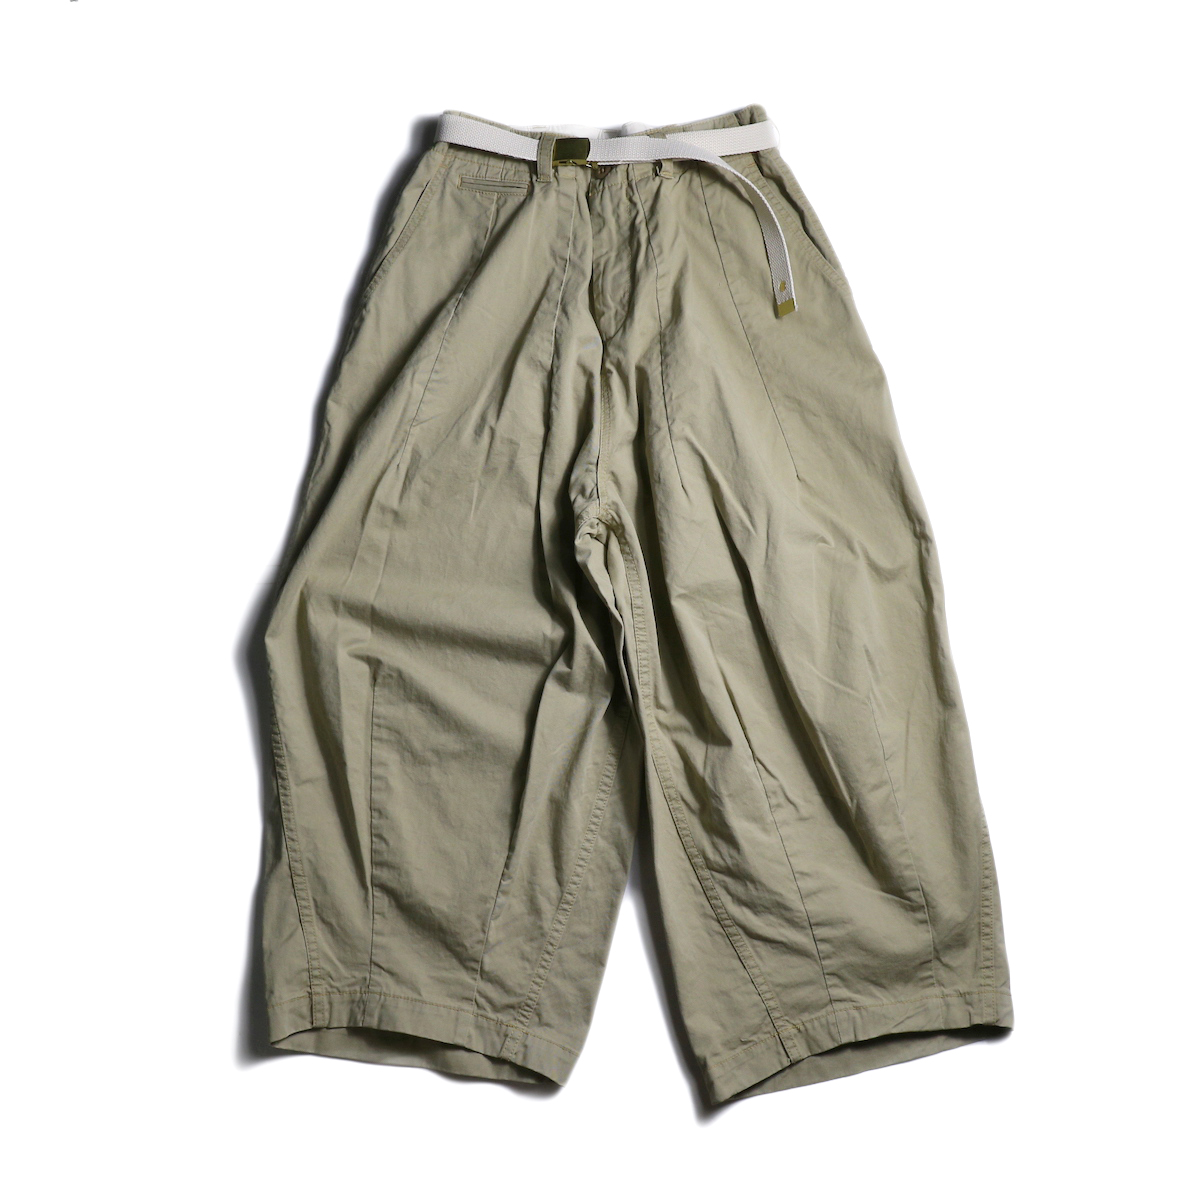 MASTER&Co. / Chino Farmars Pants (Beige)